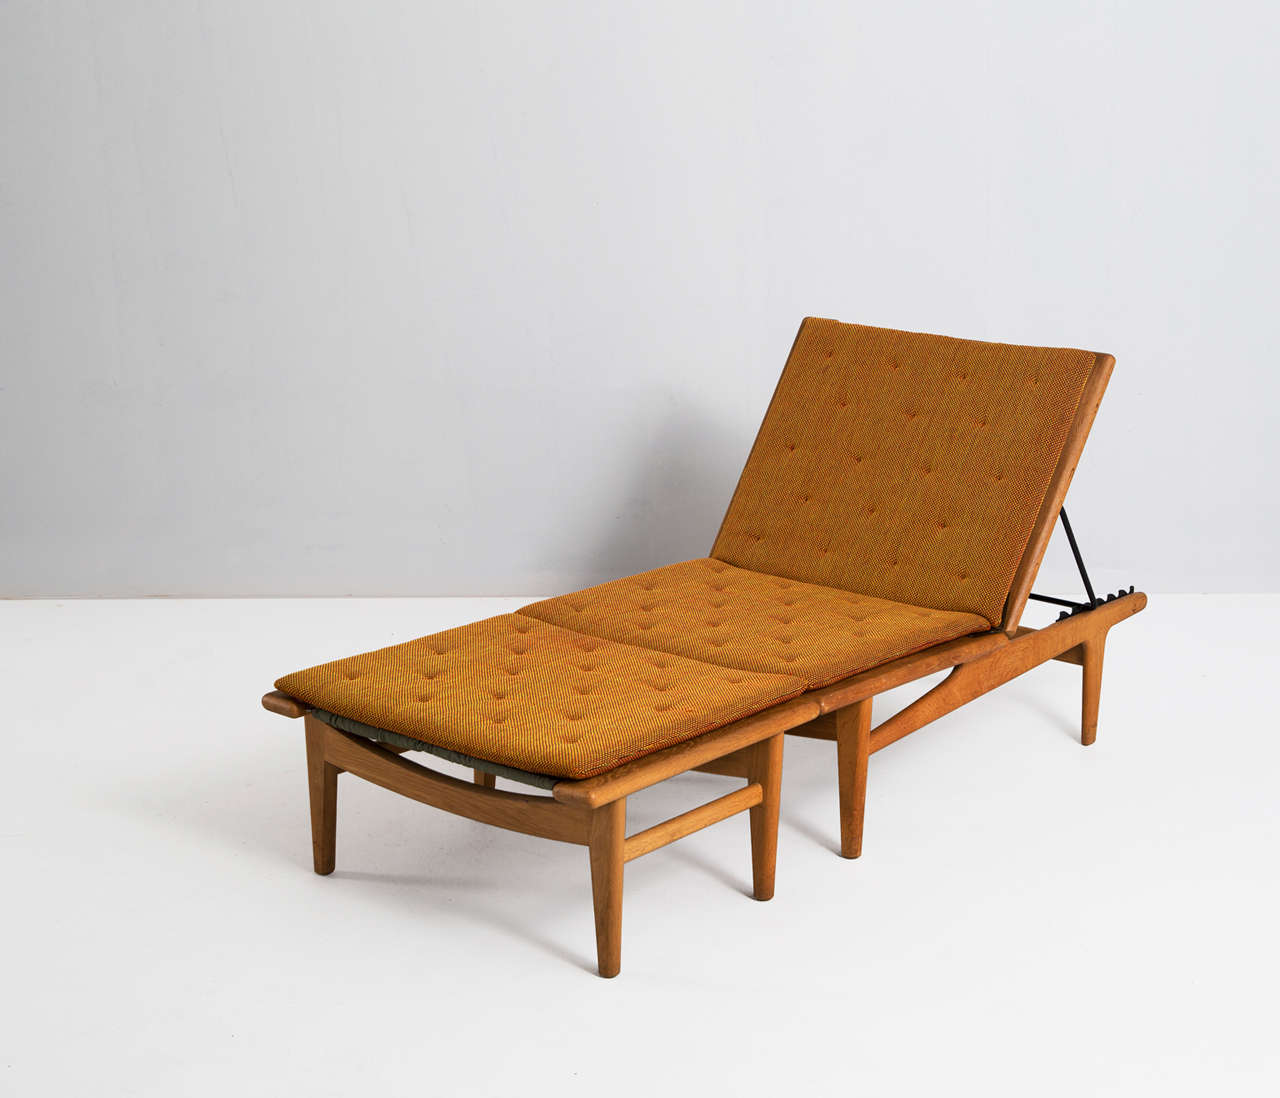 Solid Oak Hans J Wegner Chaise Longue For Getama At 1stdibs